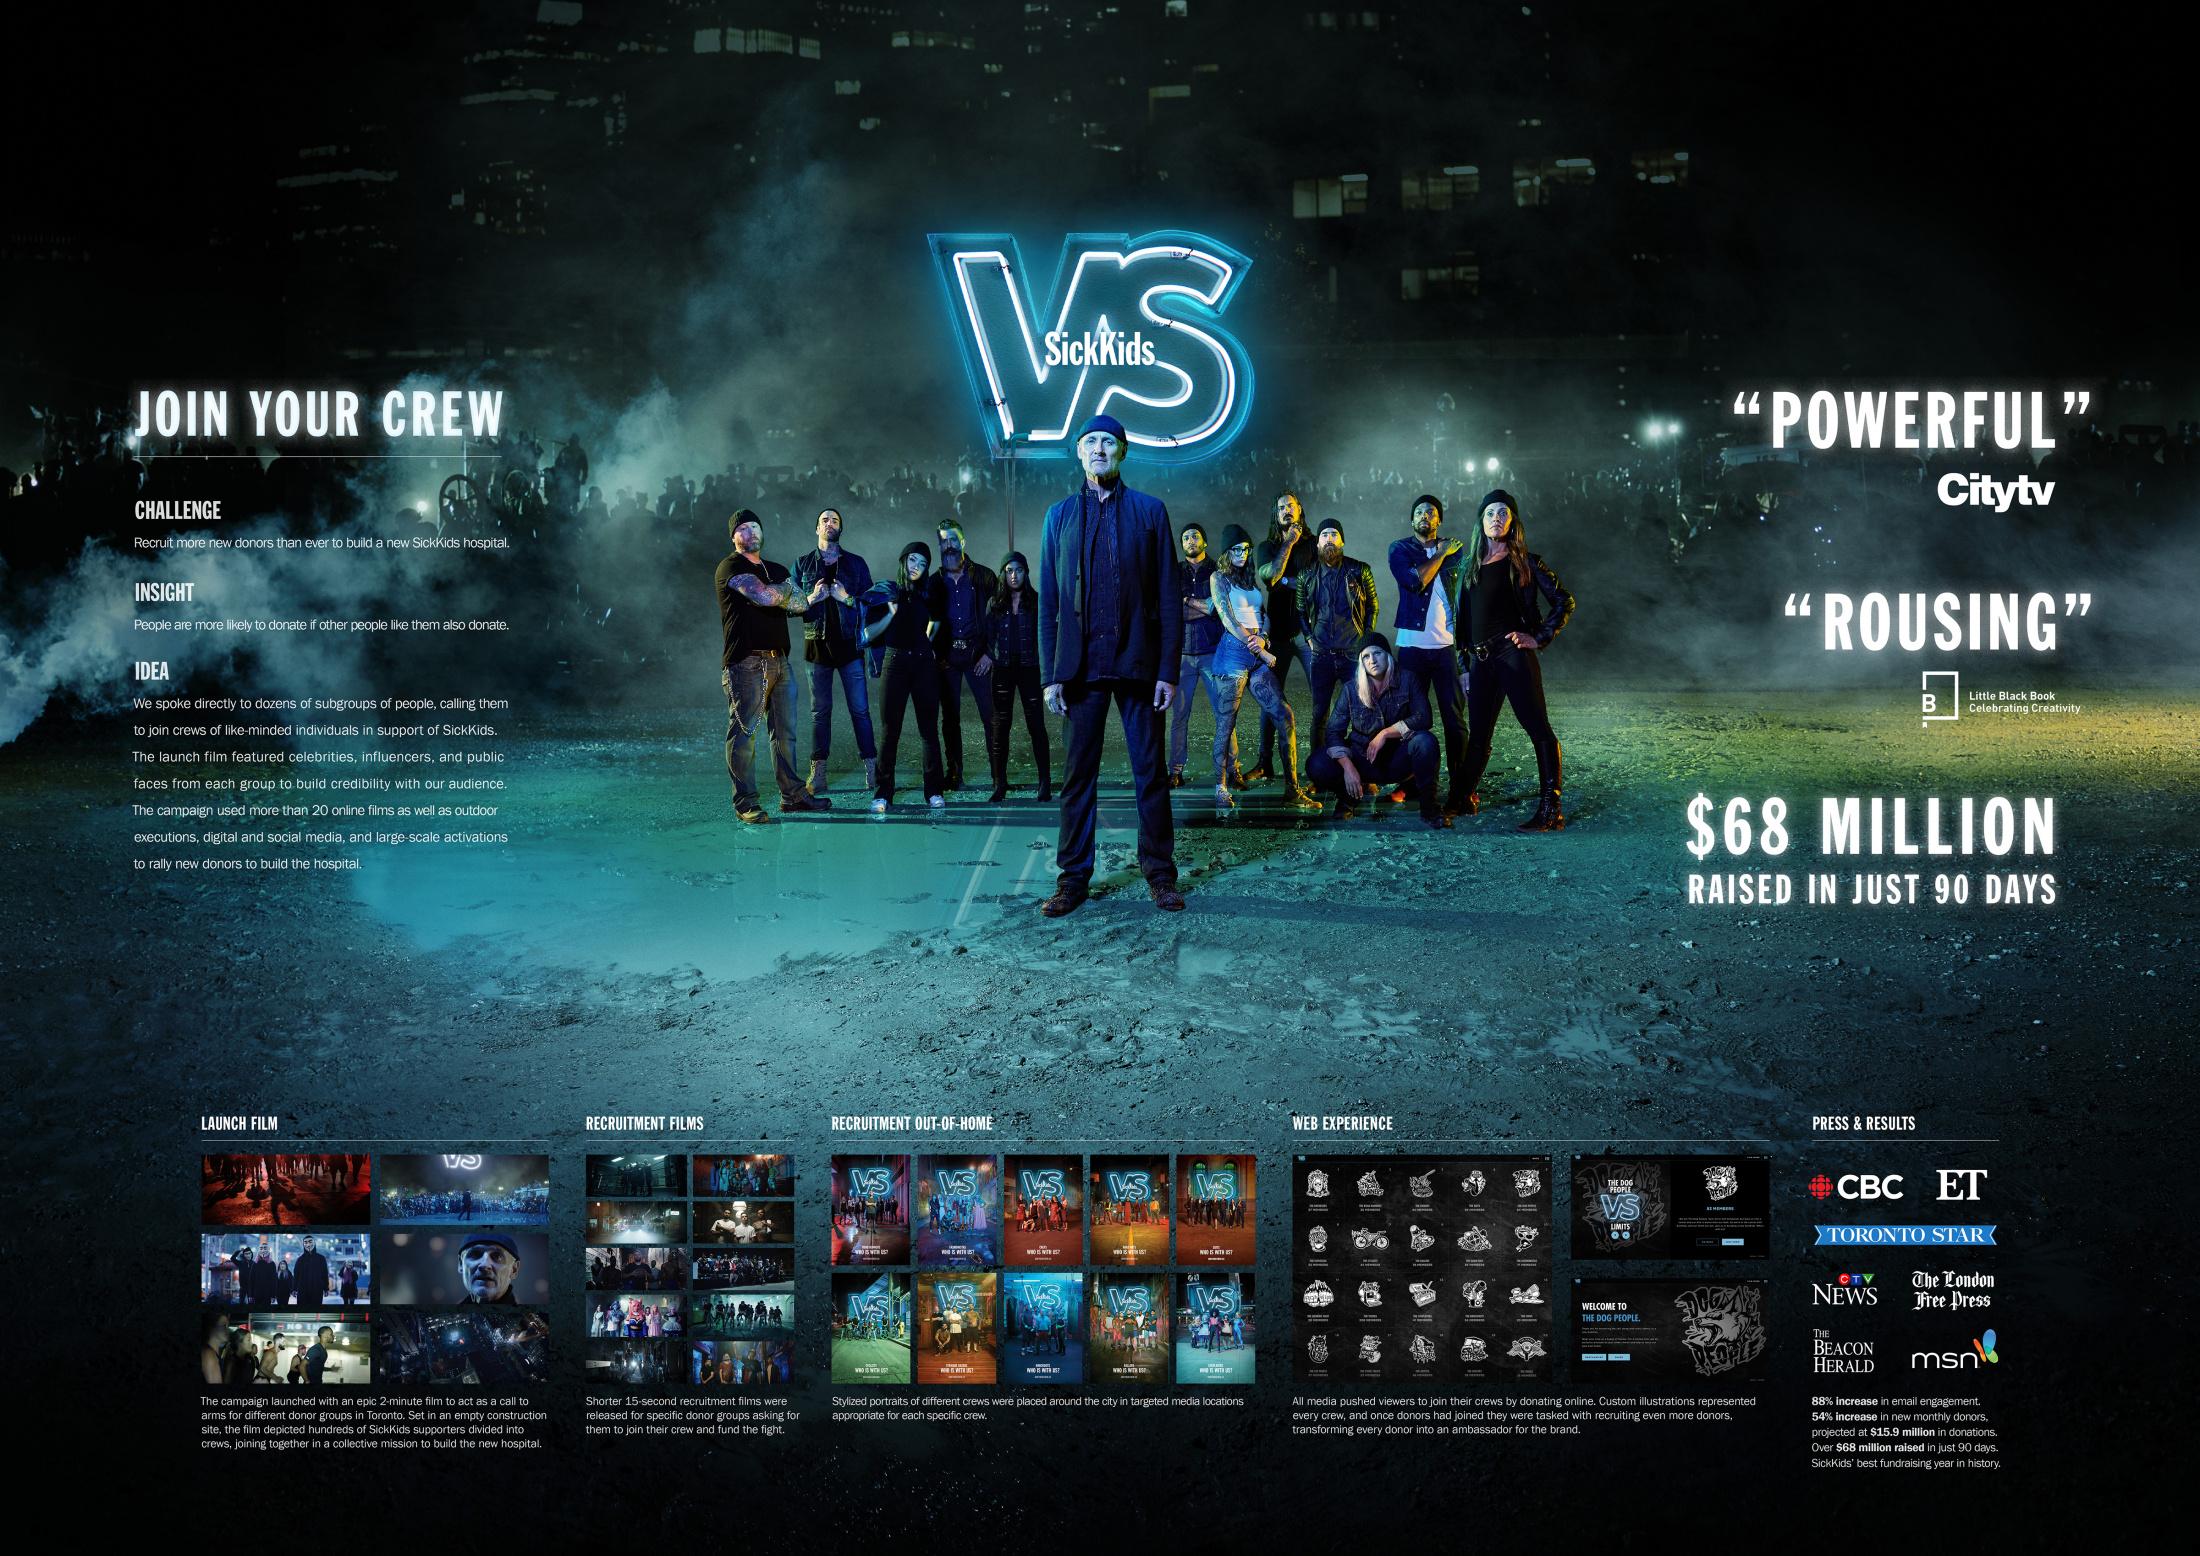 SickKids VS - Crews Thumbnail